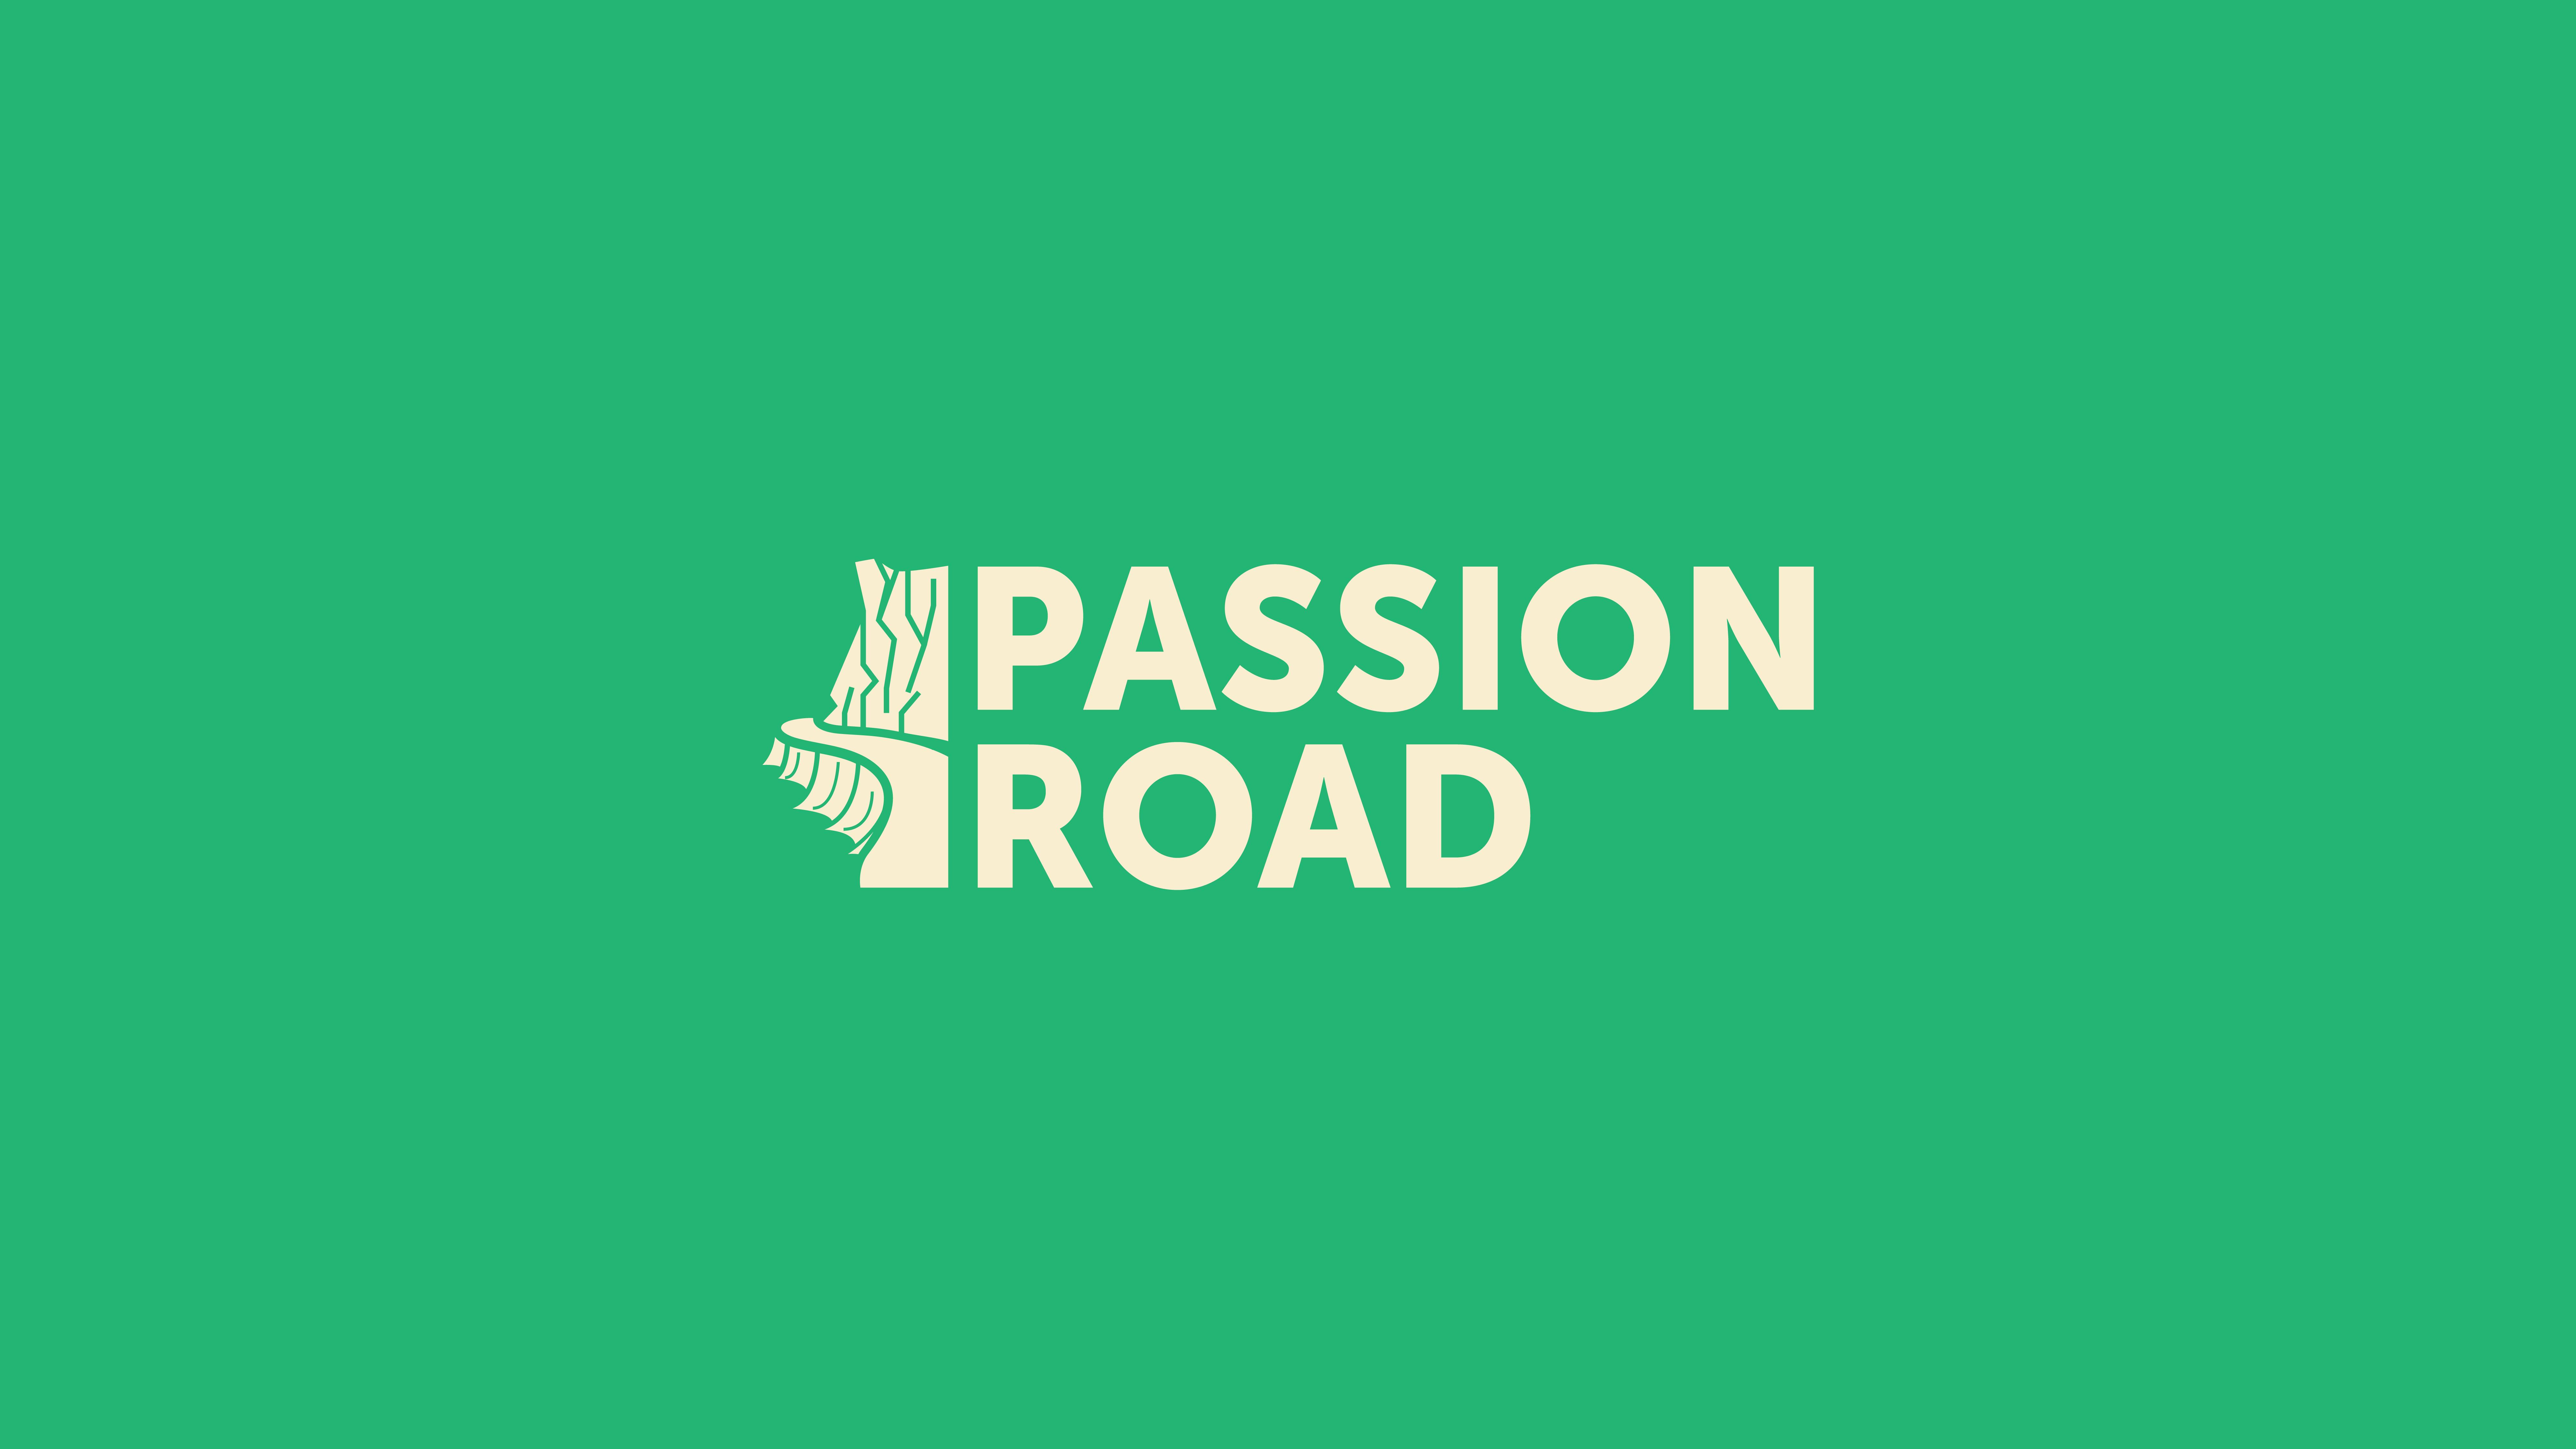 Passion_Road-28